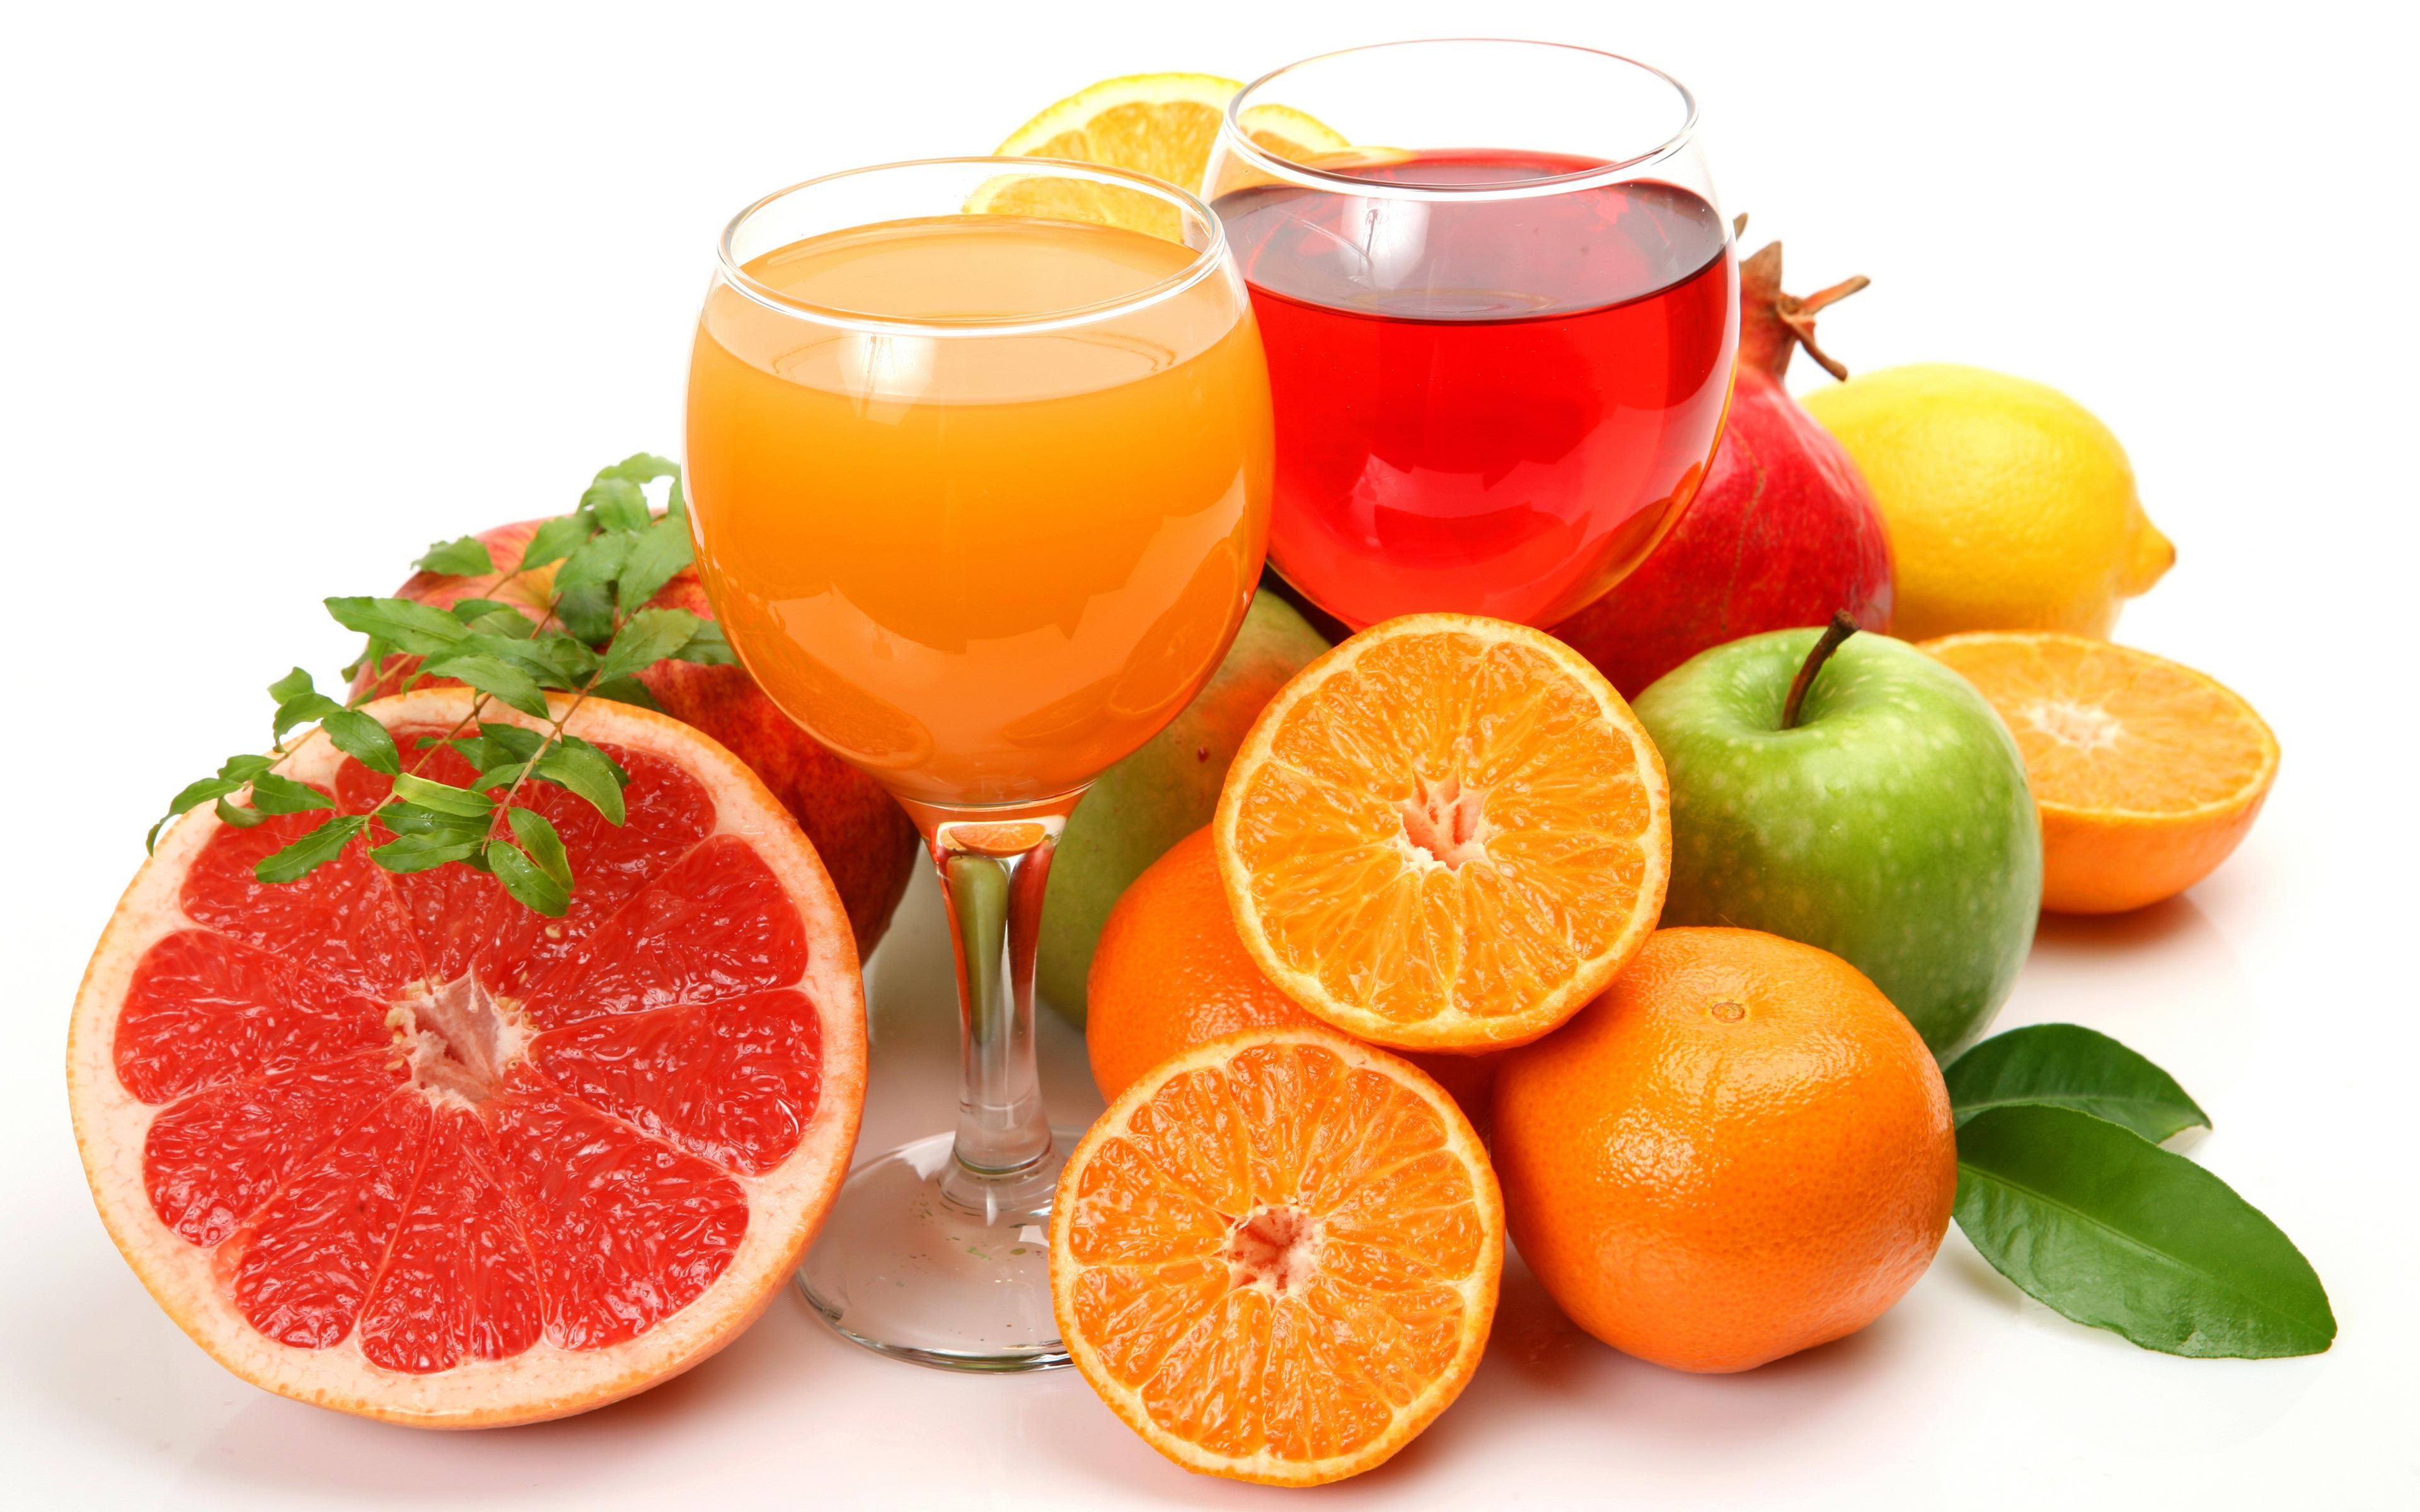 Fruit-Juice-Wallpaper-Gallery.jpg